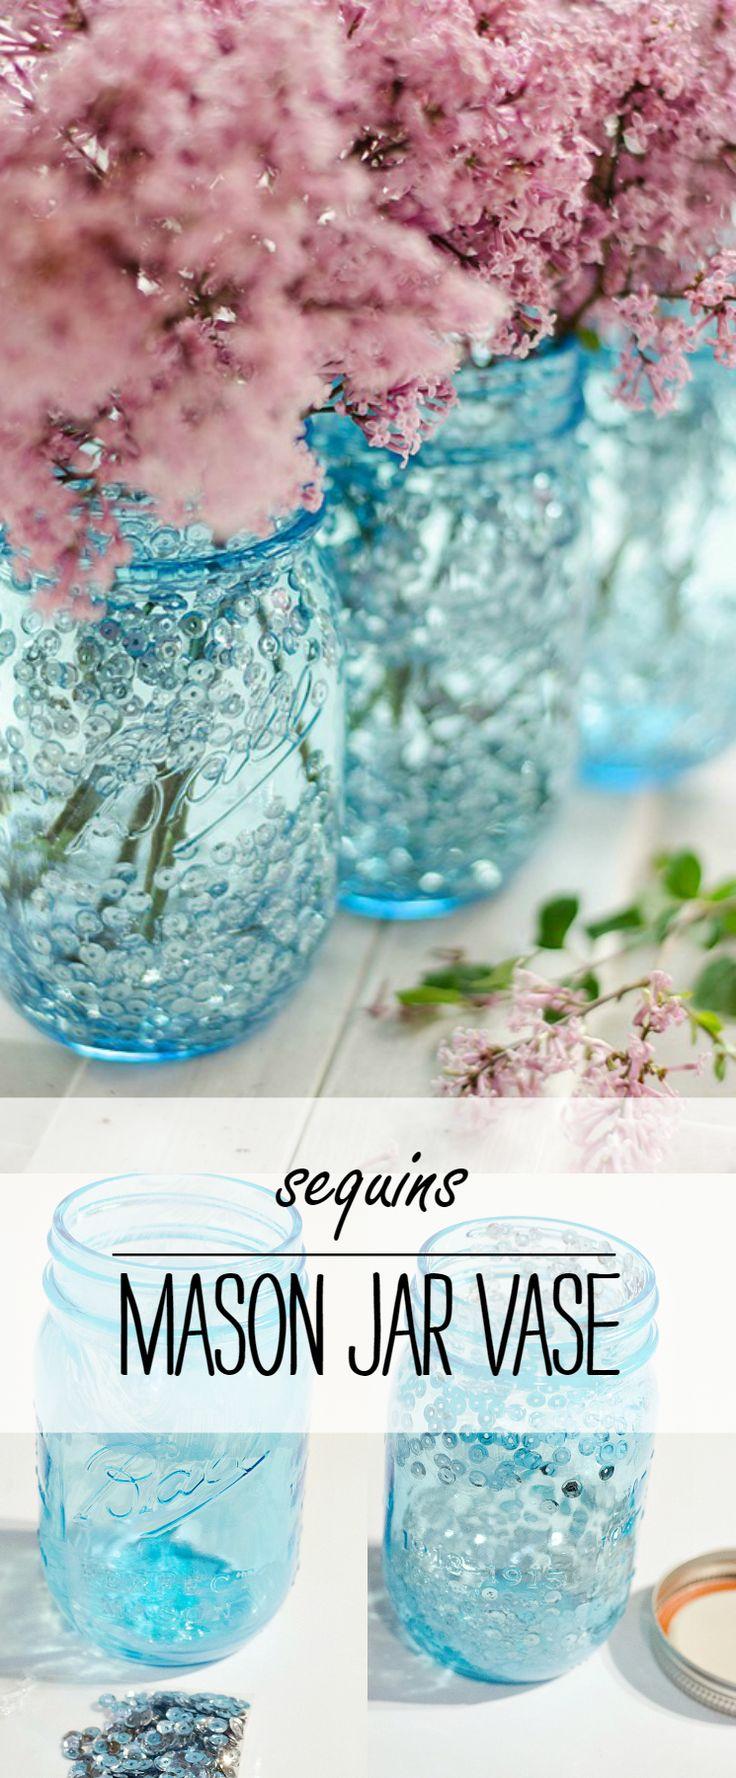 Centerpiece Ideas for Weddings Using Mason Jars